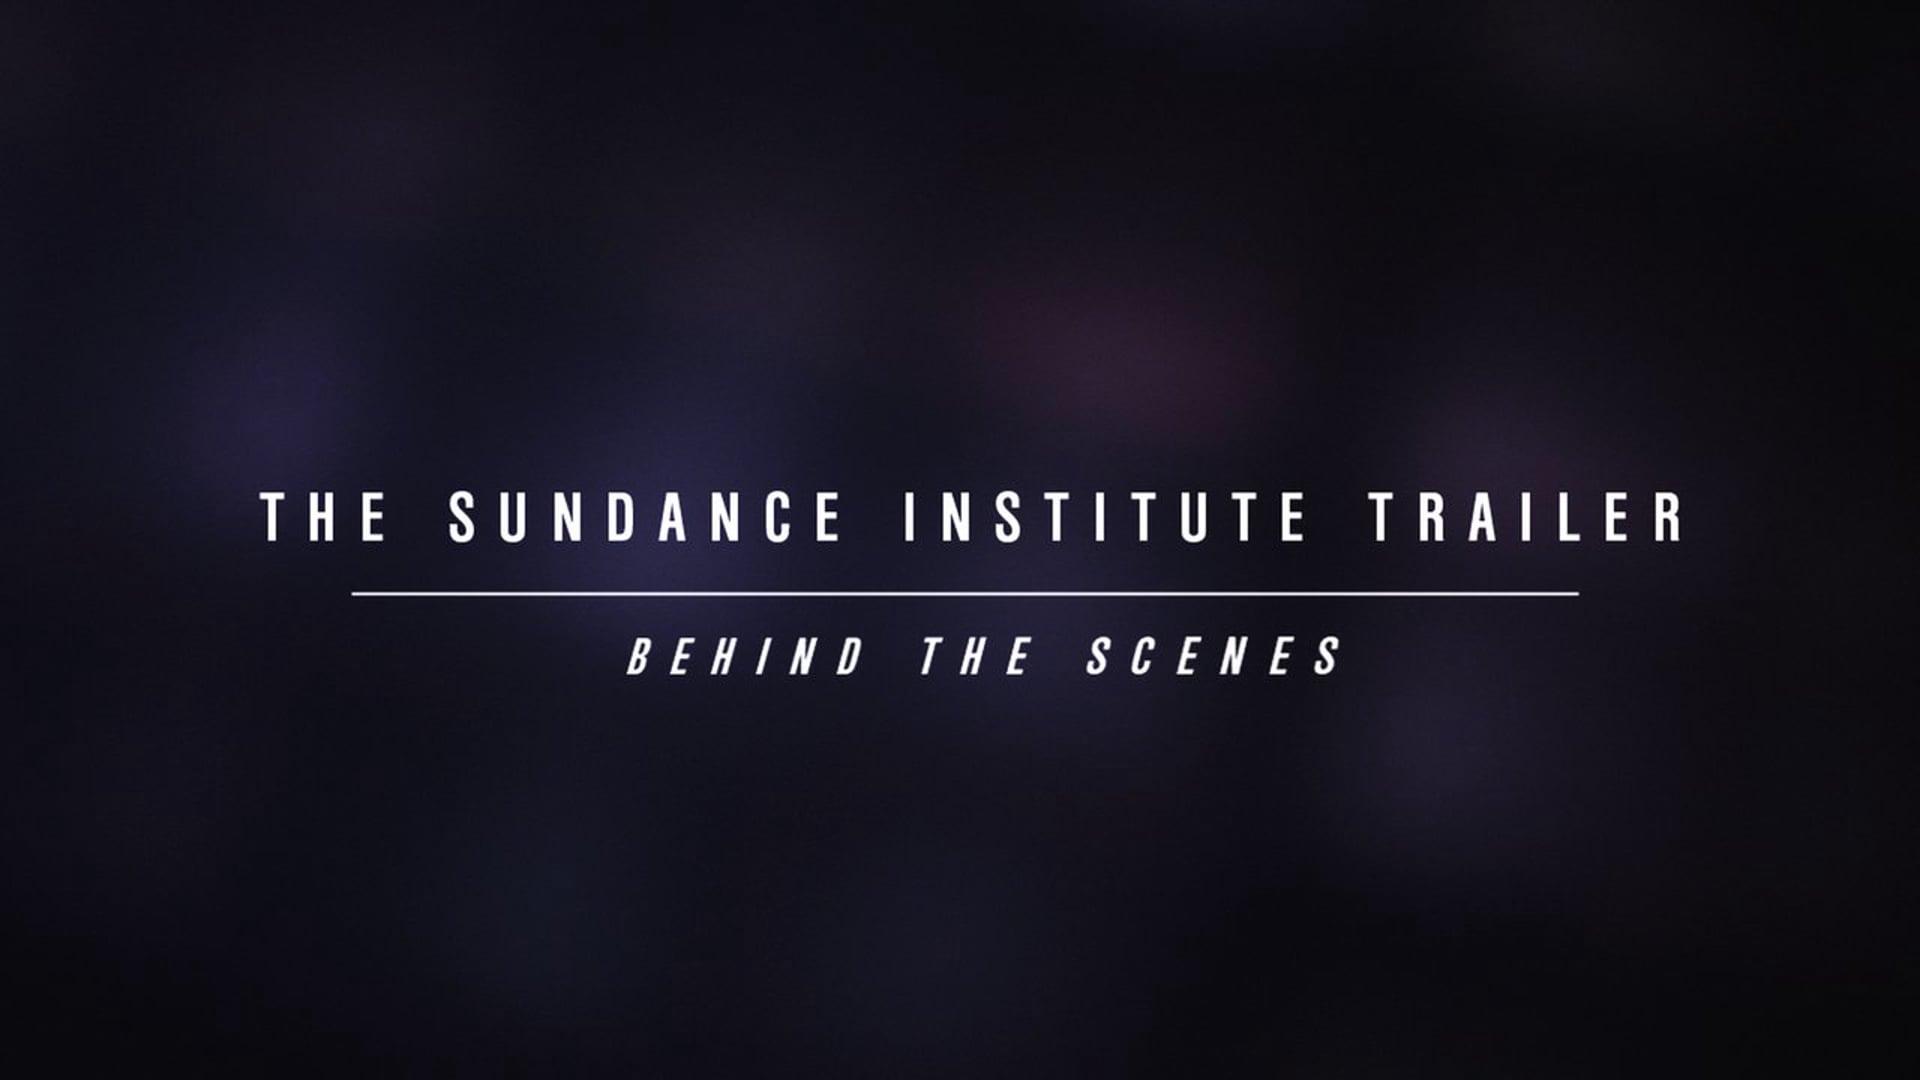 The Sundance Institute Trailer: Behind the Scenes